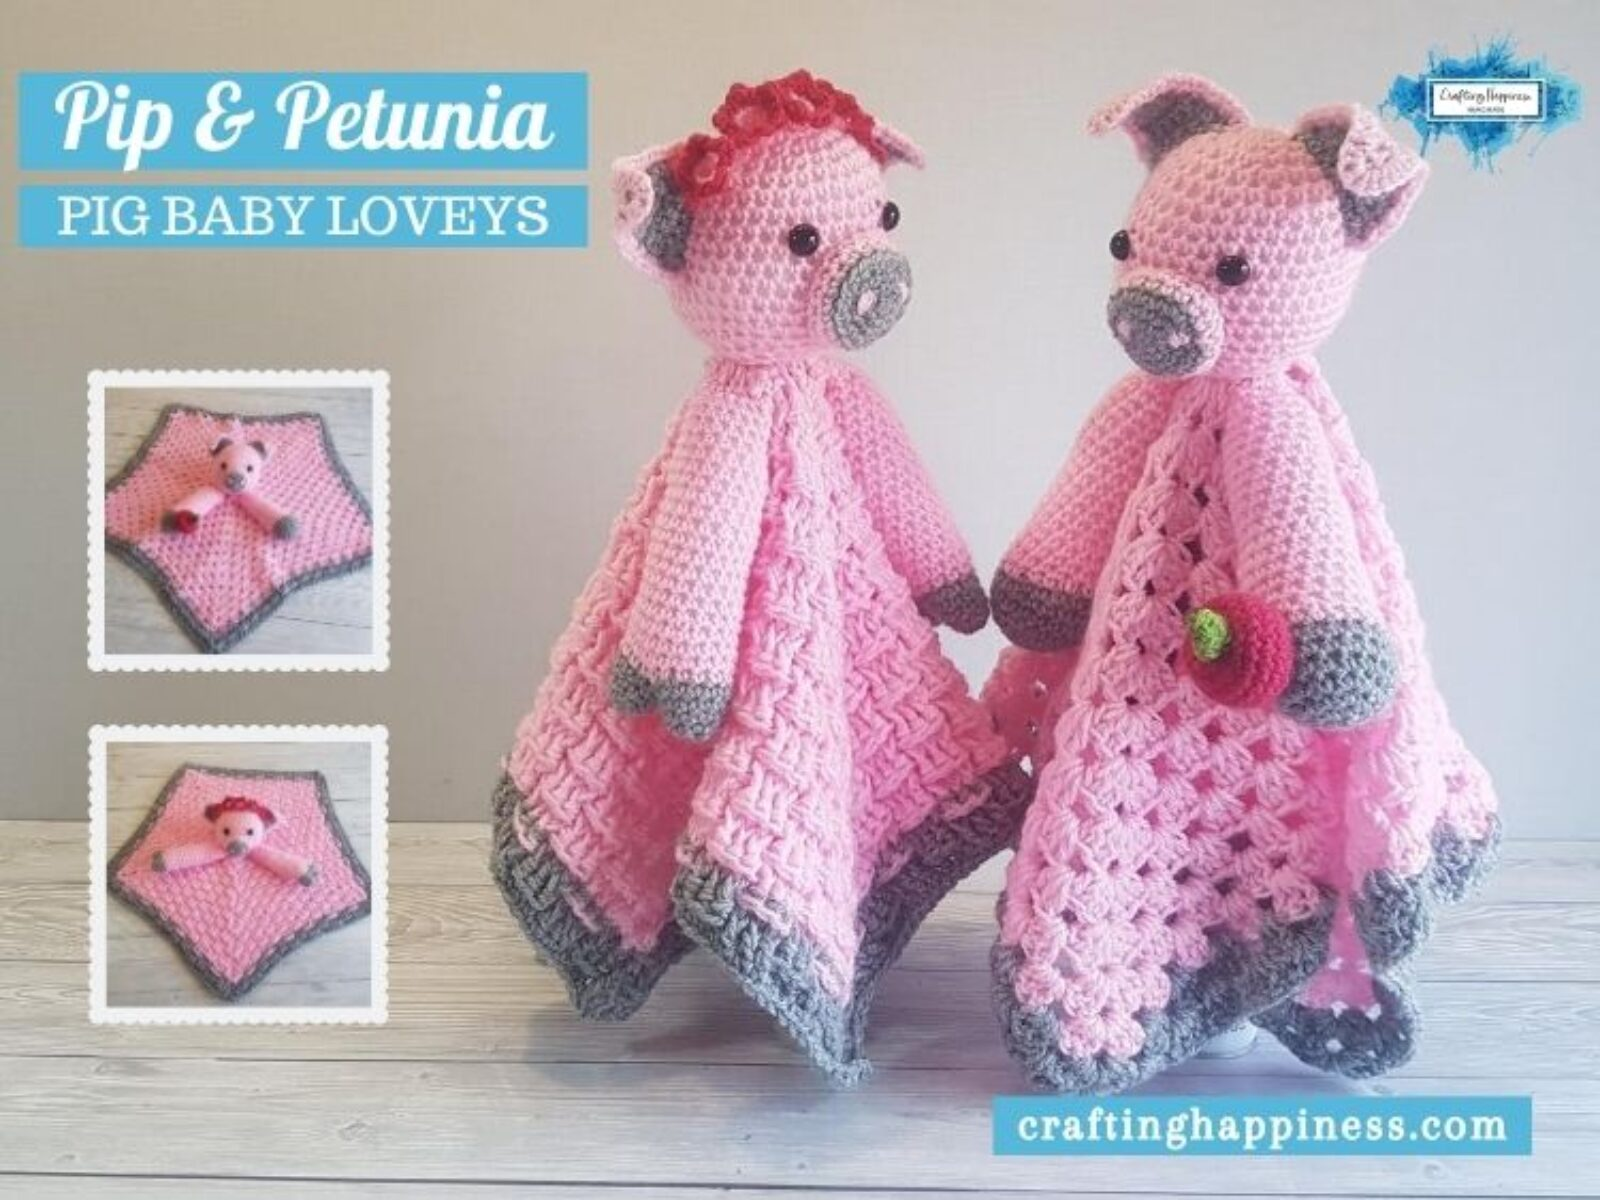 Pip & Petunia Baby Lovey - FACEBOOK POSTER